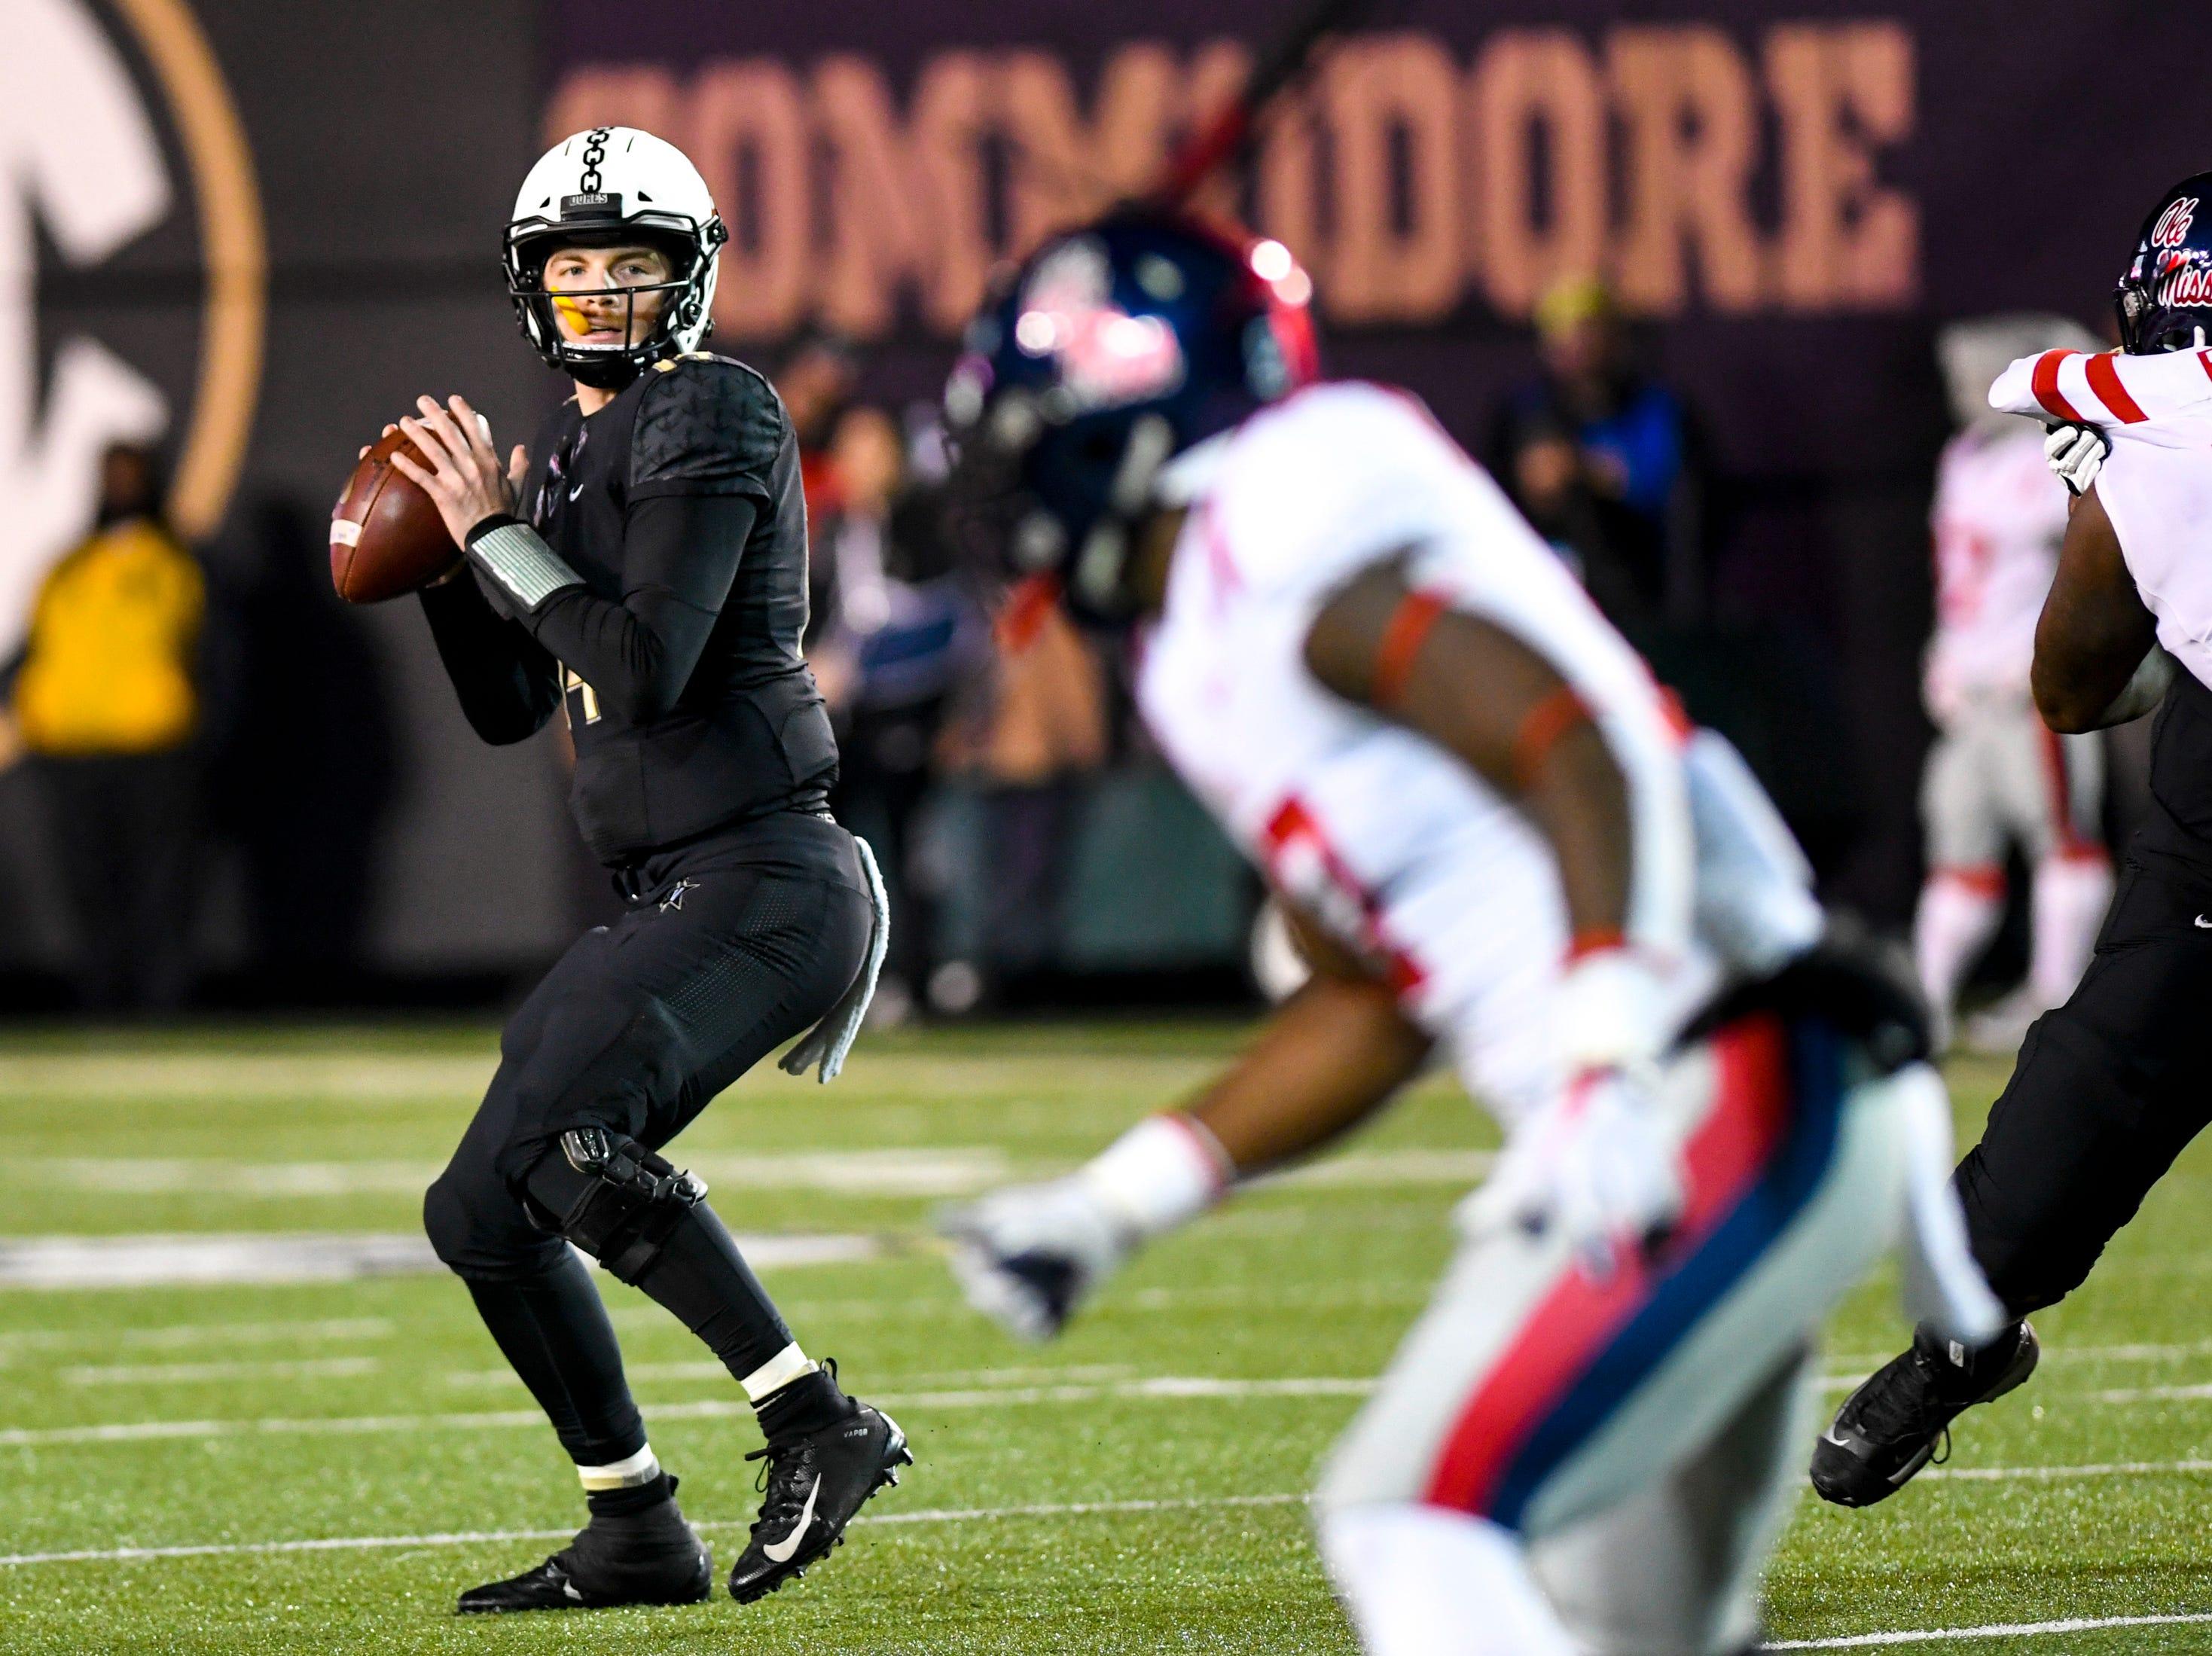 Vanderbilt quarterback Kyle Shurmur (14) looks to pass during Vanderbilt's game against Ole Miss at Vanderbilt Stadium in Nashville on Saturday, Nov. 17, 2018.